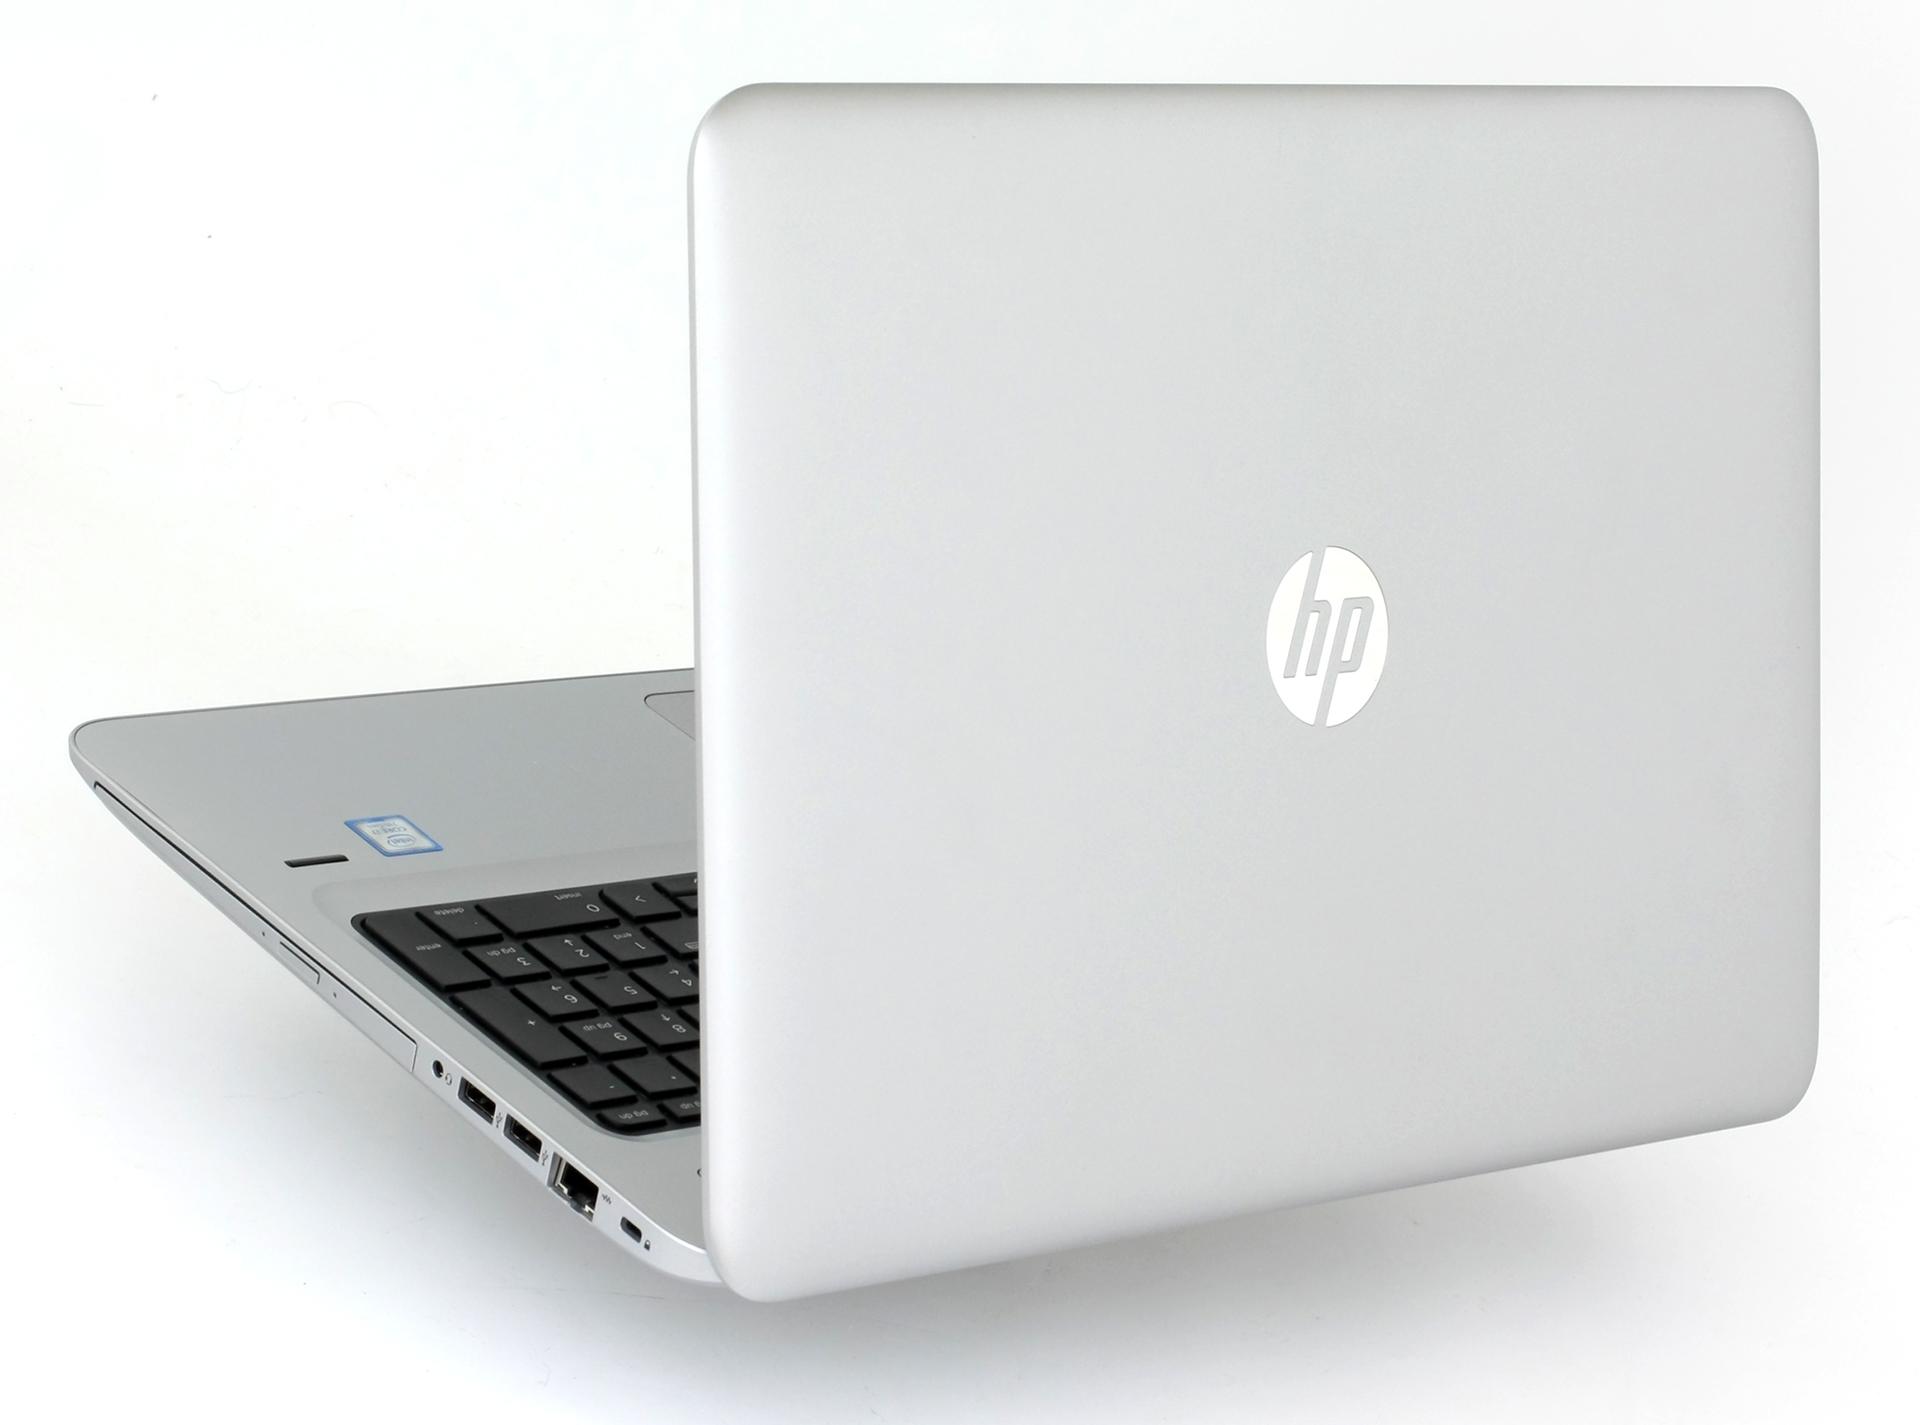 hp laptop probook 450 g4 review